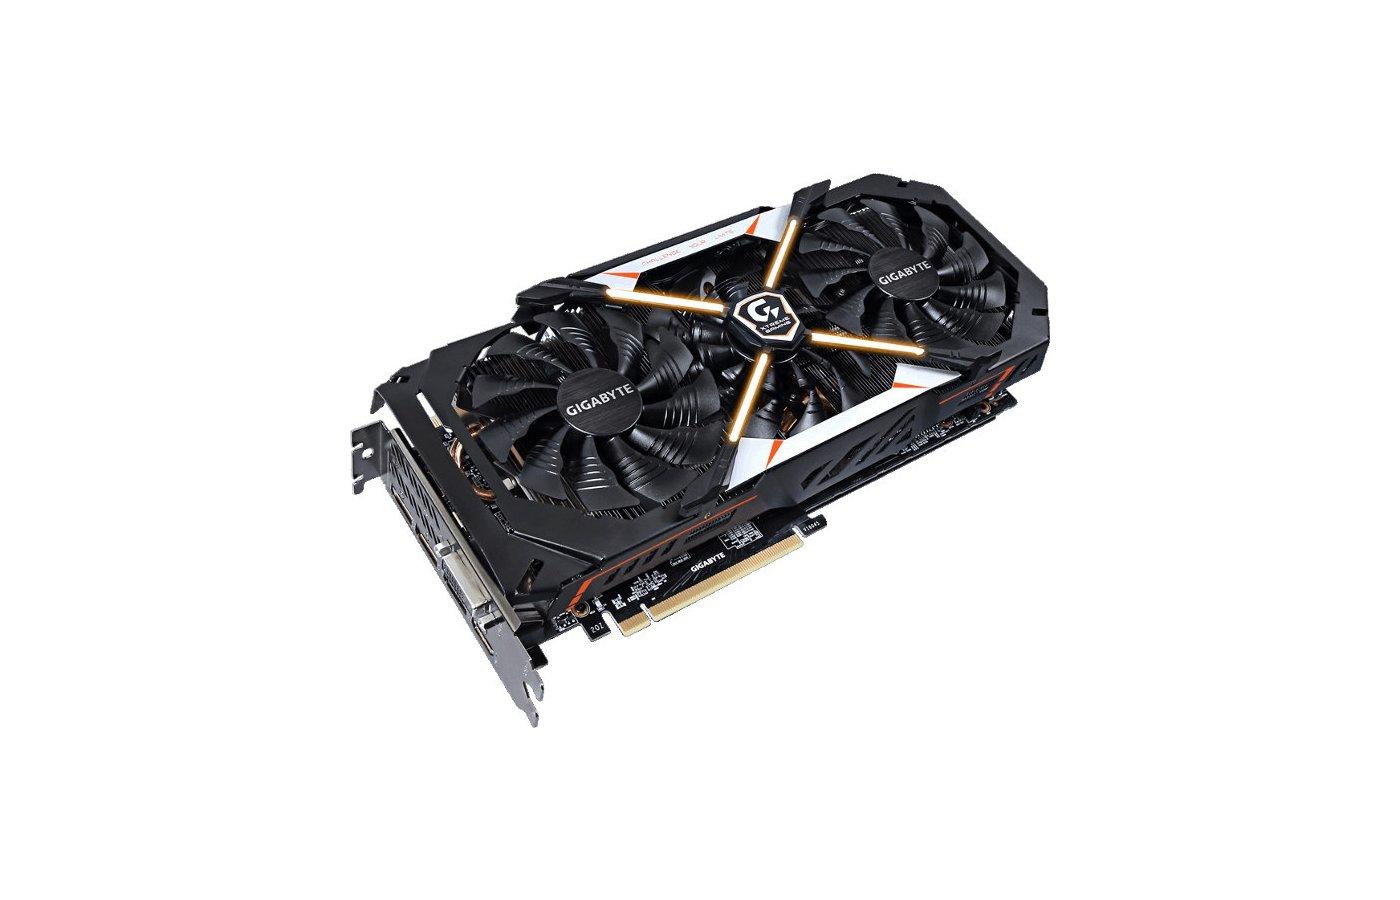 Видеокарта Gigabyte PCI-E GV-N1080XTREME-8GD-PP nVidia GeForce GTX 1080 8192Mb 256bit Ret